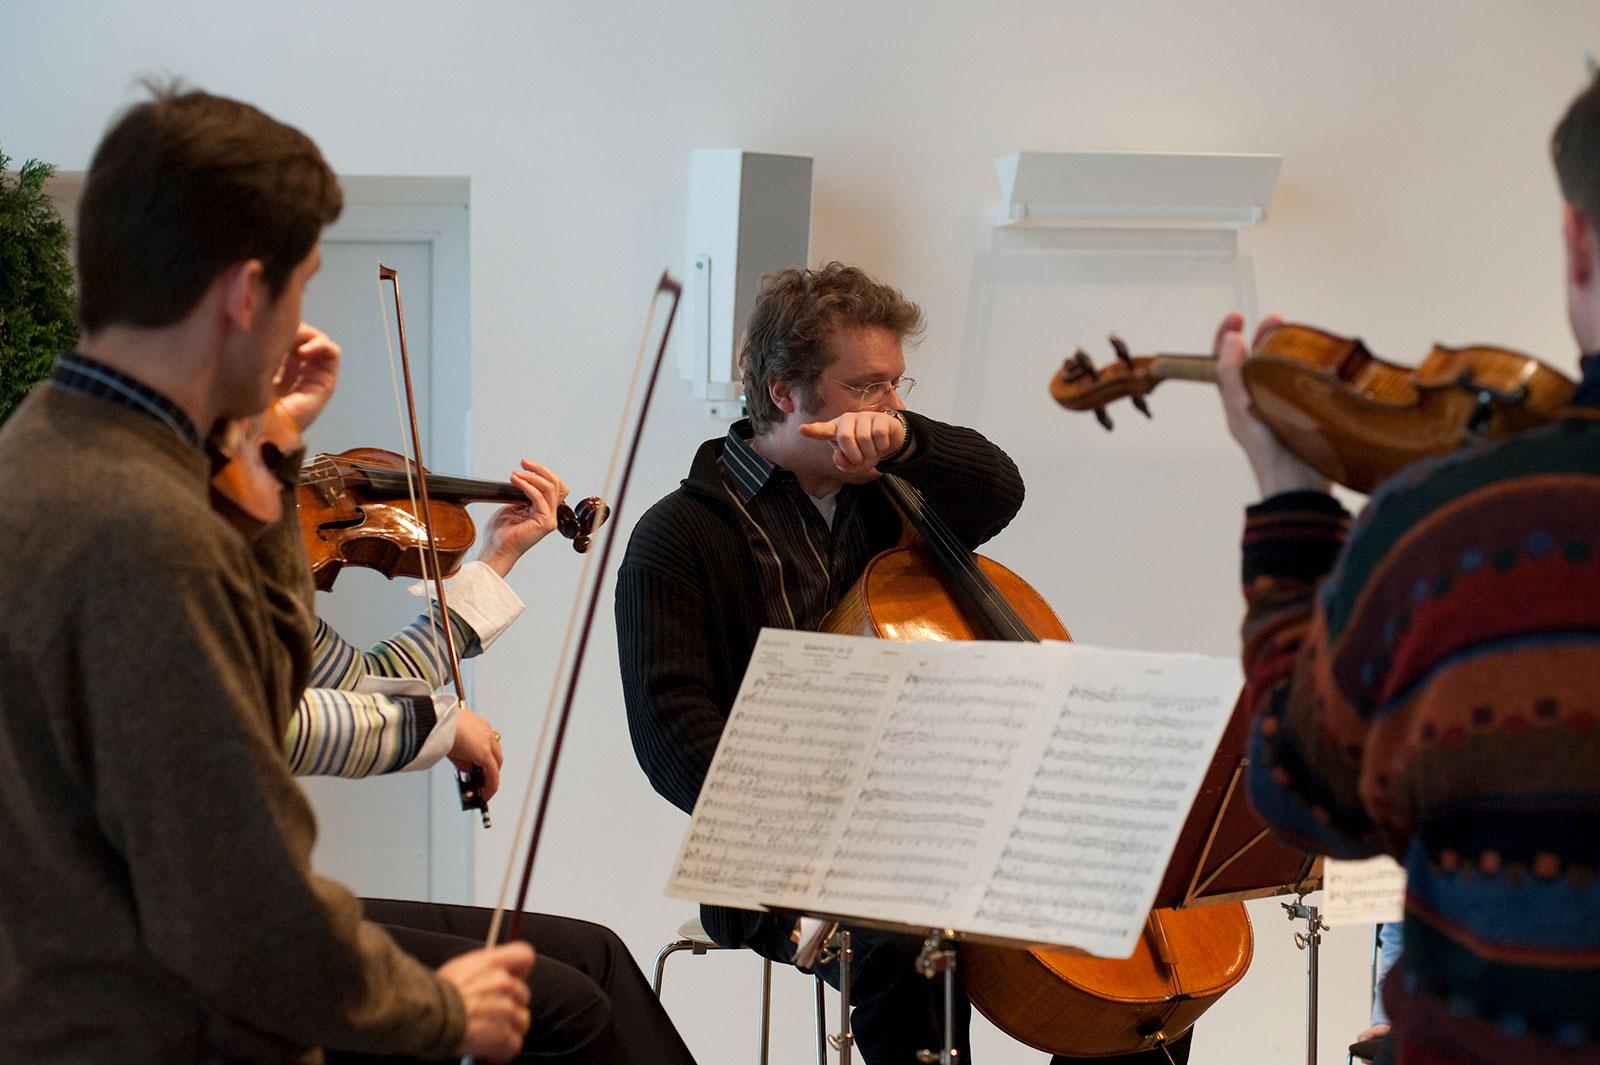 Henschel-Quartett-in-Ebenhausen-242.jpg